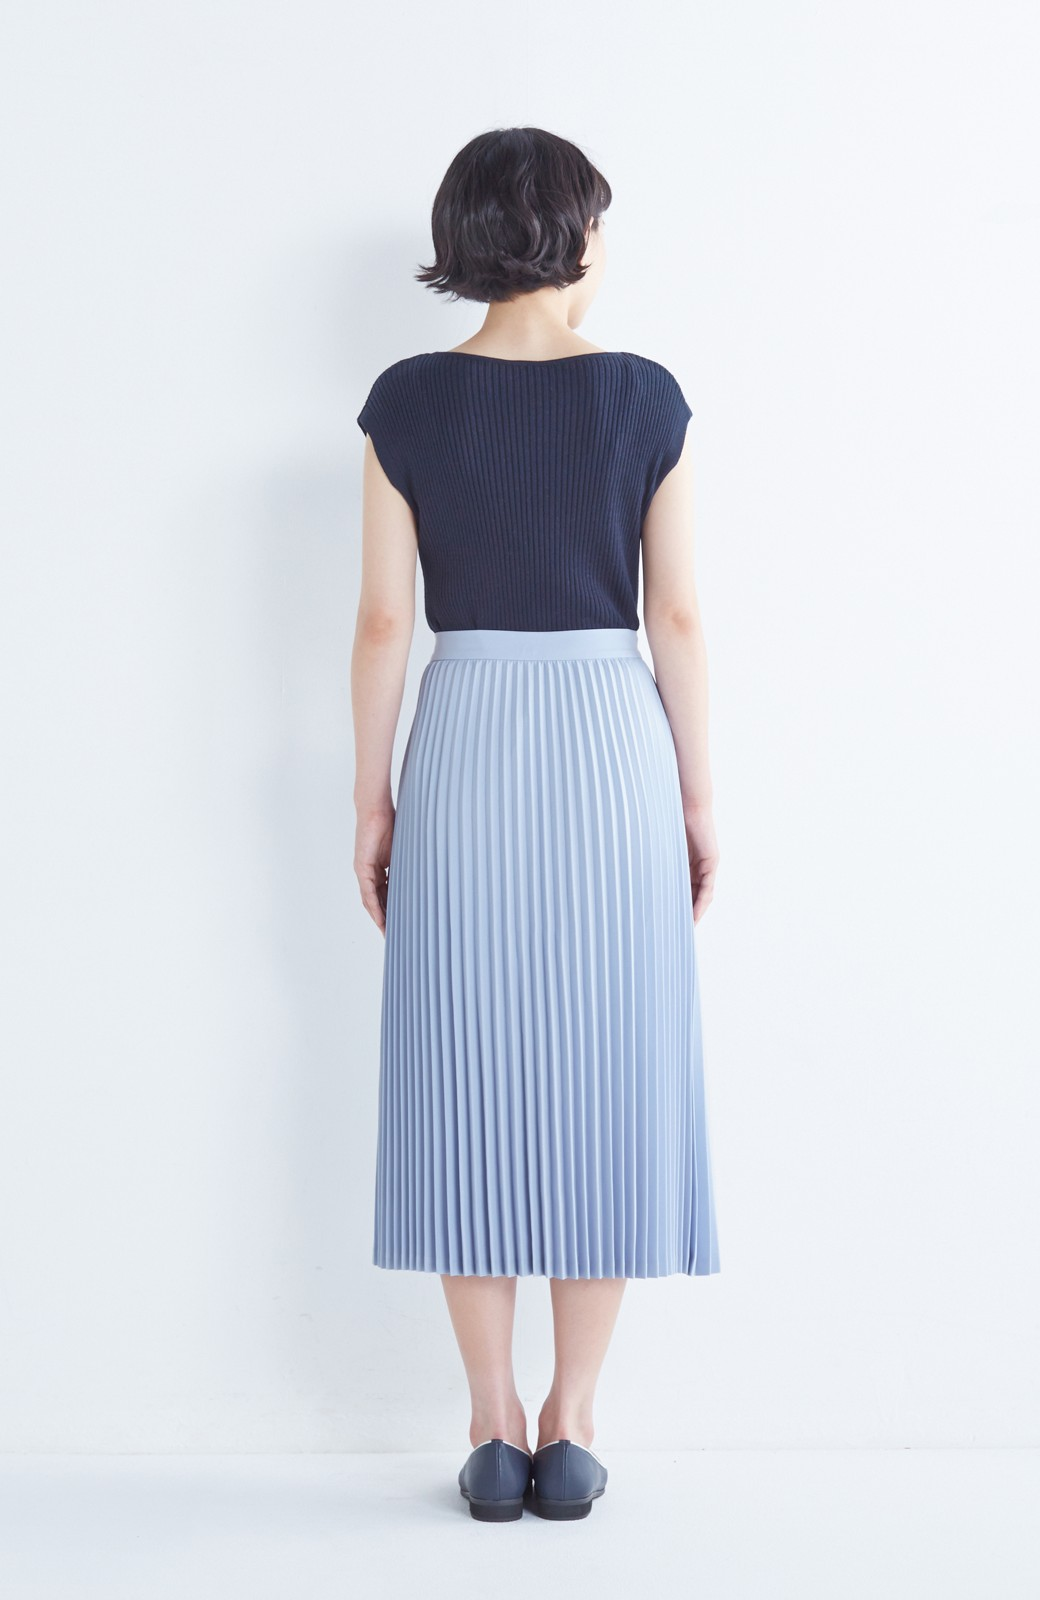 haco! 【mer11月号掲載】折り目正しい大人のためのプリーツスカート by que made me <サックスブルー>の商品写真5